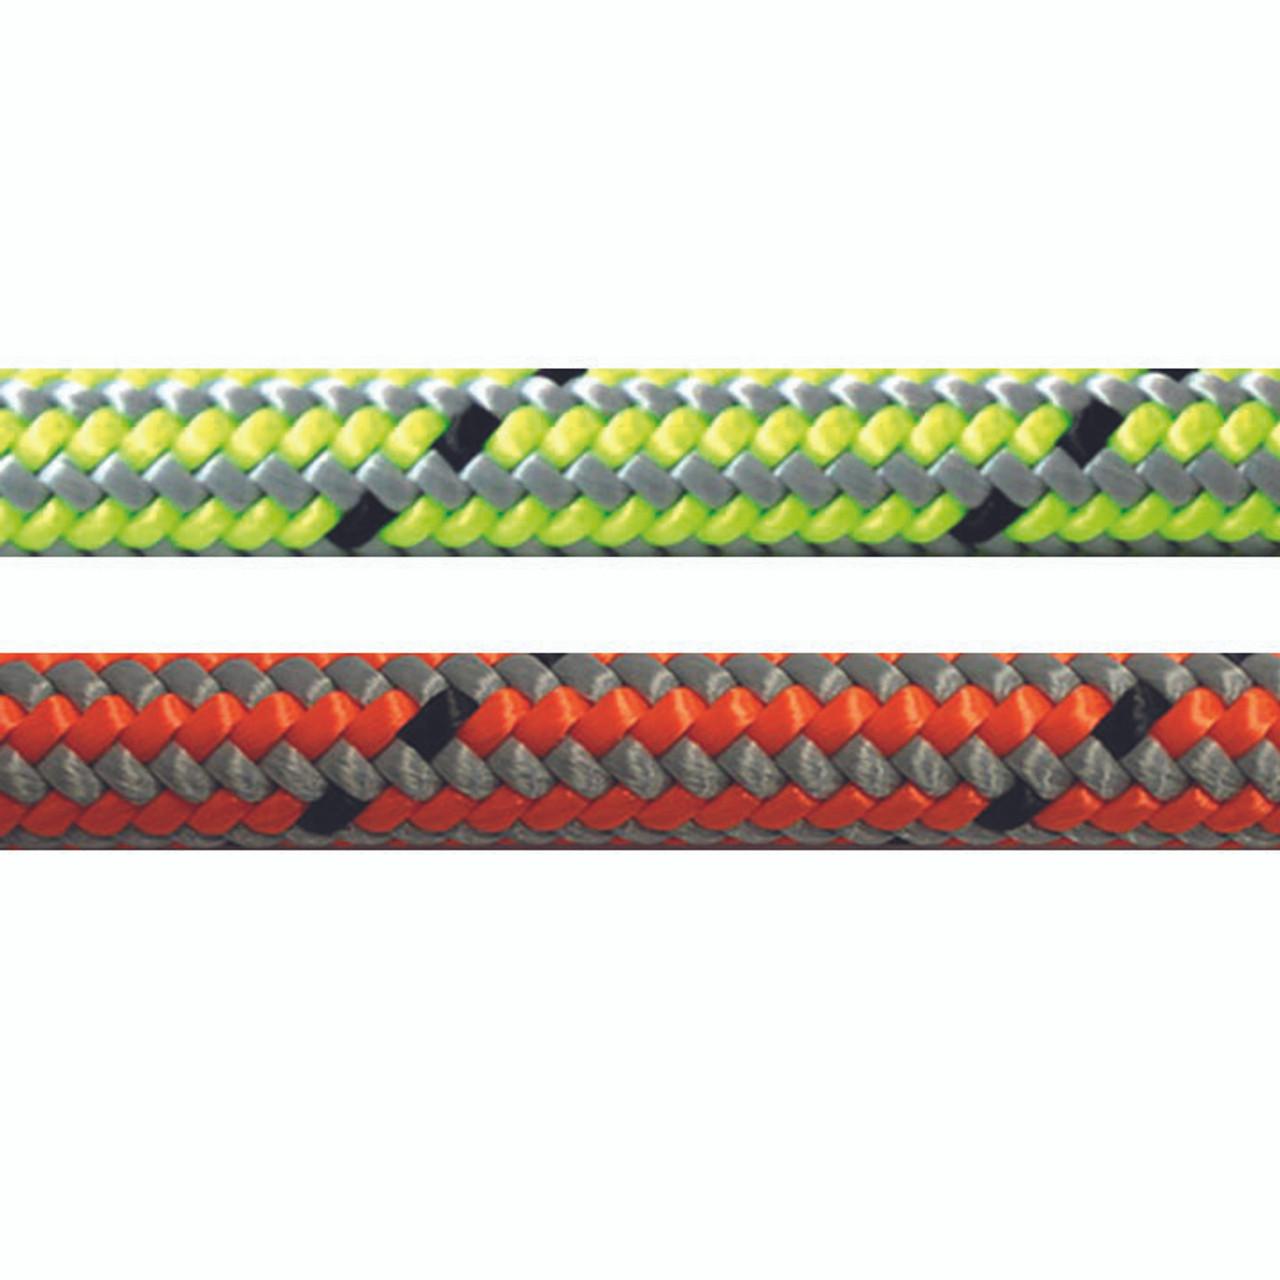 Marlow Vega Orange 11.7mm Split Tail 3.5m